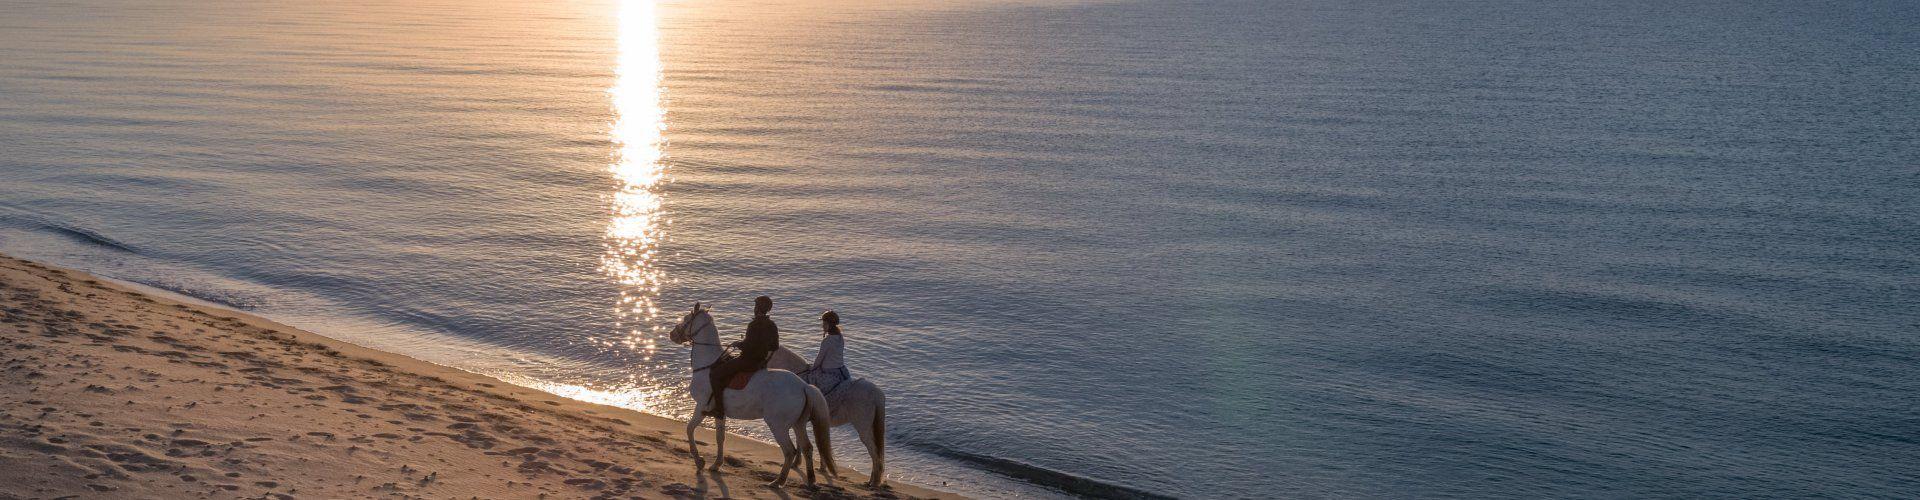 Reiten an der Costa Rei im Sonnenaufgang